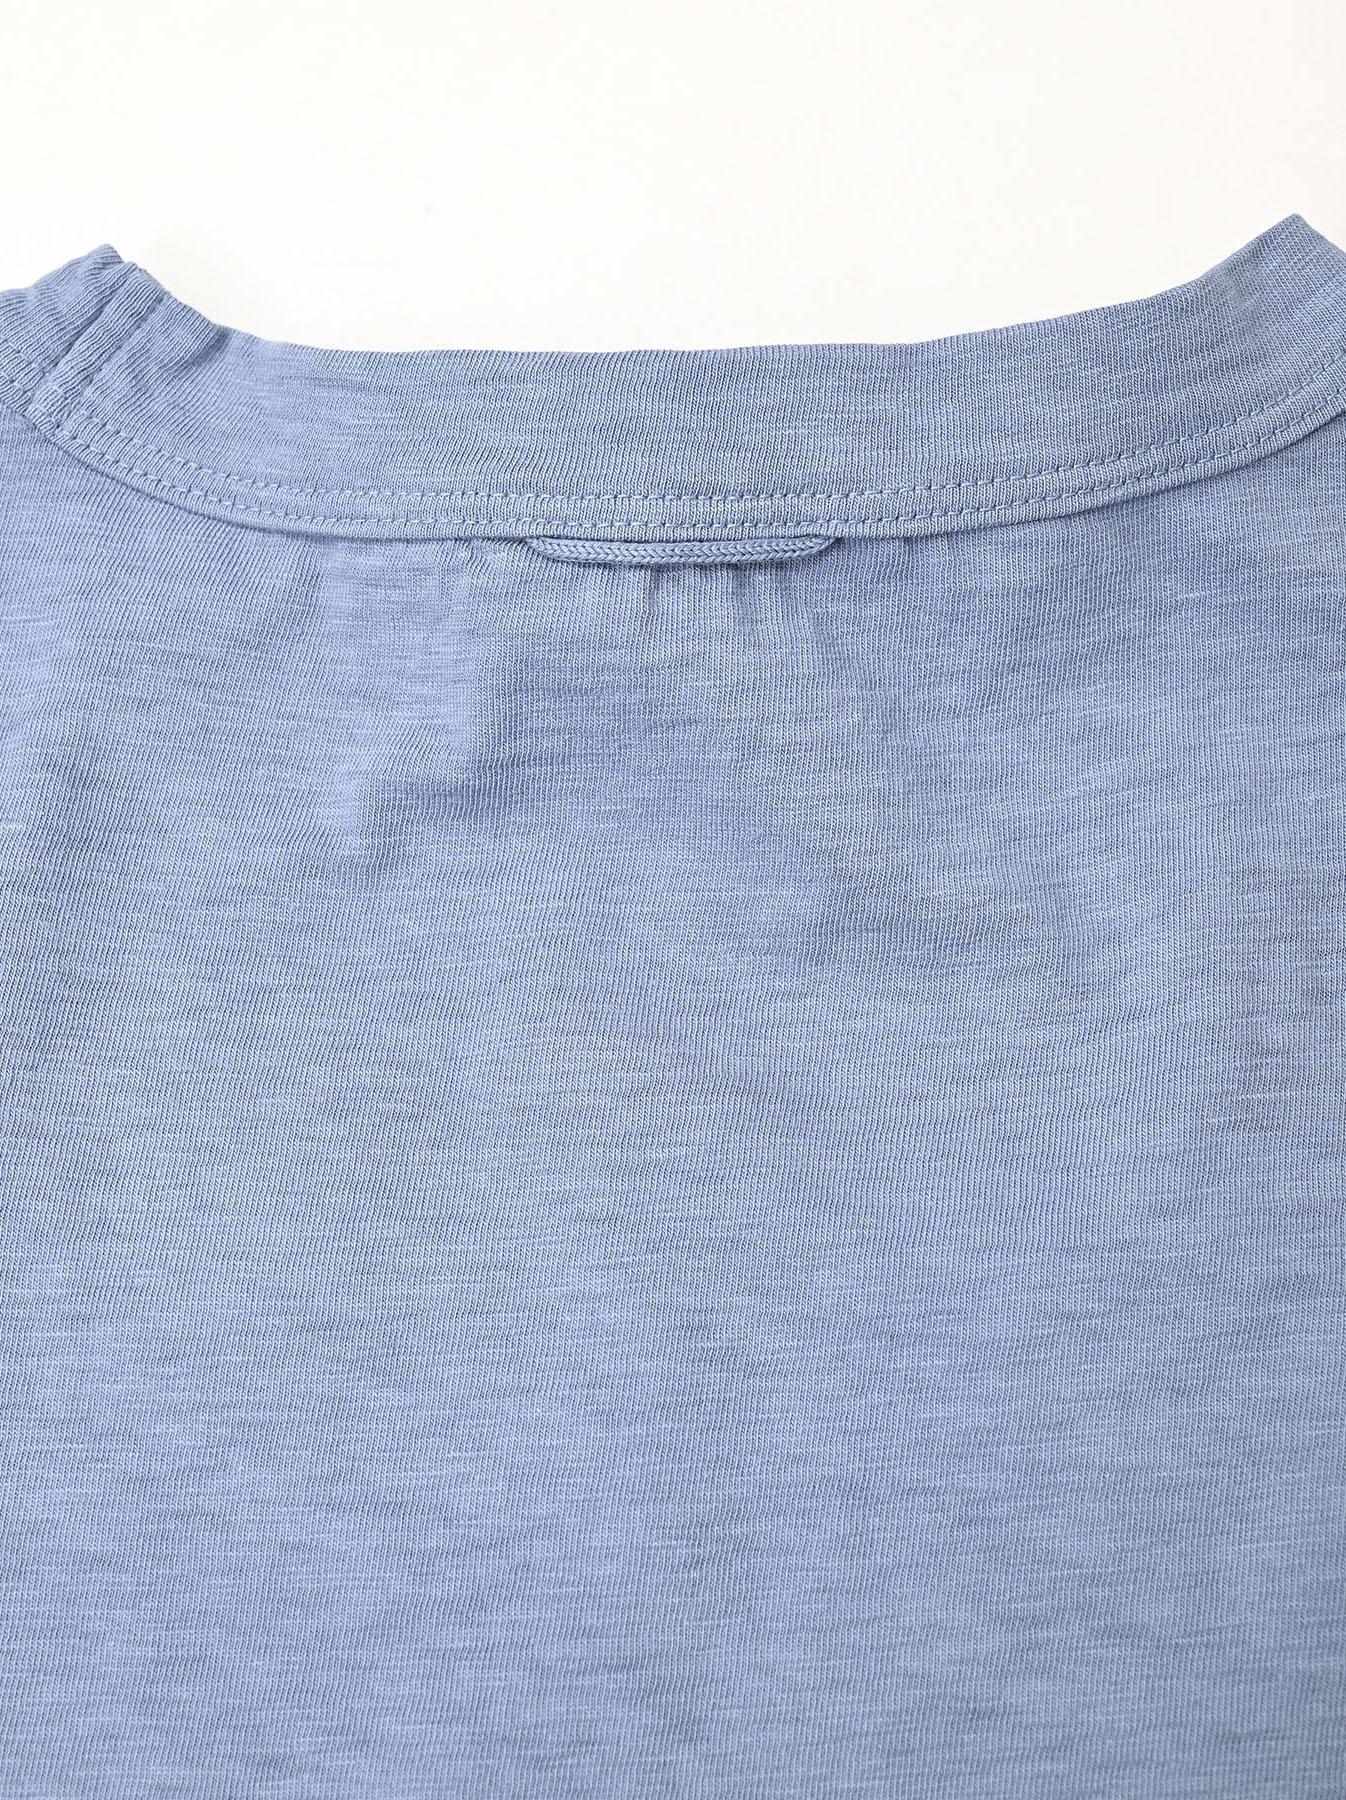 Zimbabwe Cotton 908 Ocean Long-sleeved T-shirt-10